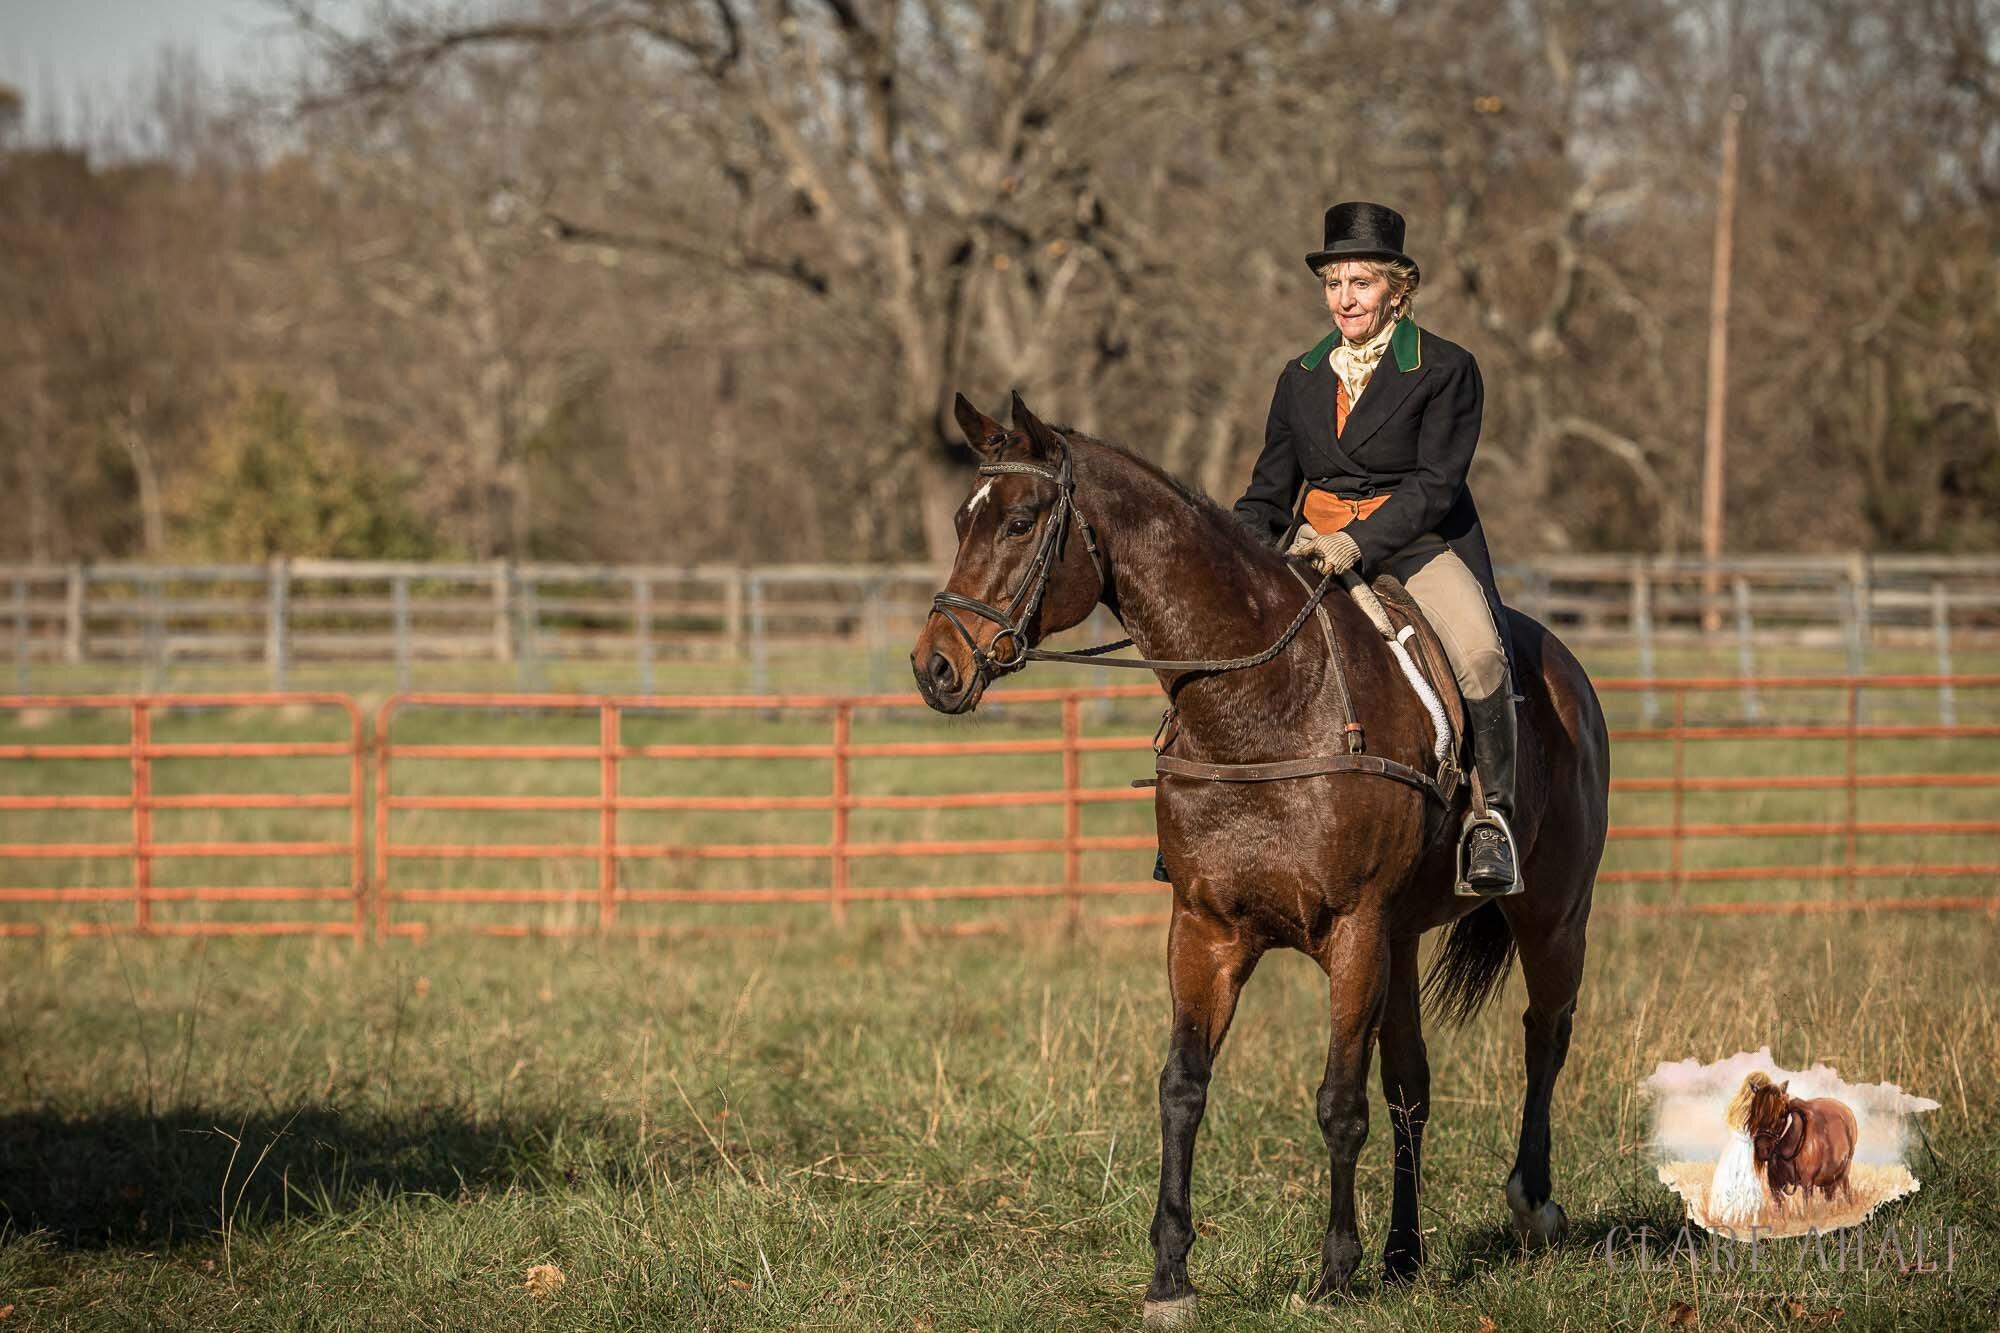 equine_photographer_potomac_md_equine_photographer_middleburg_VA_equine_portraiture_loudon_county_VA-1345.jpg